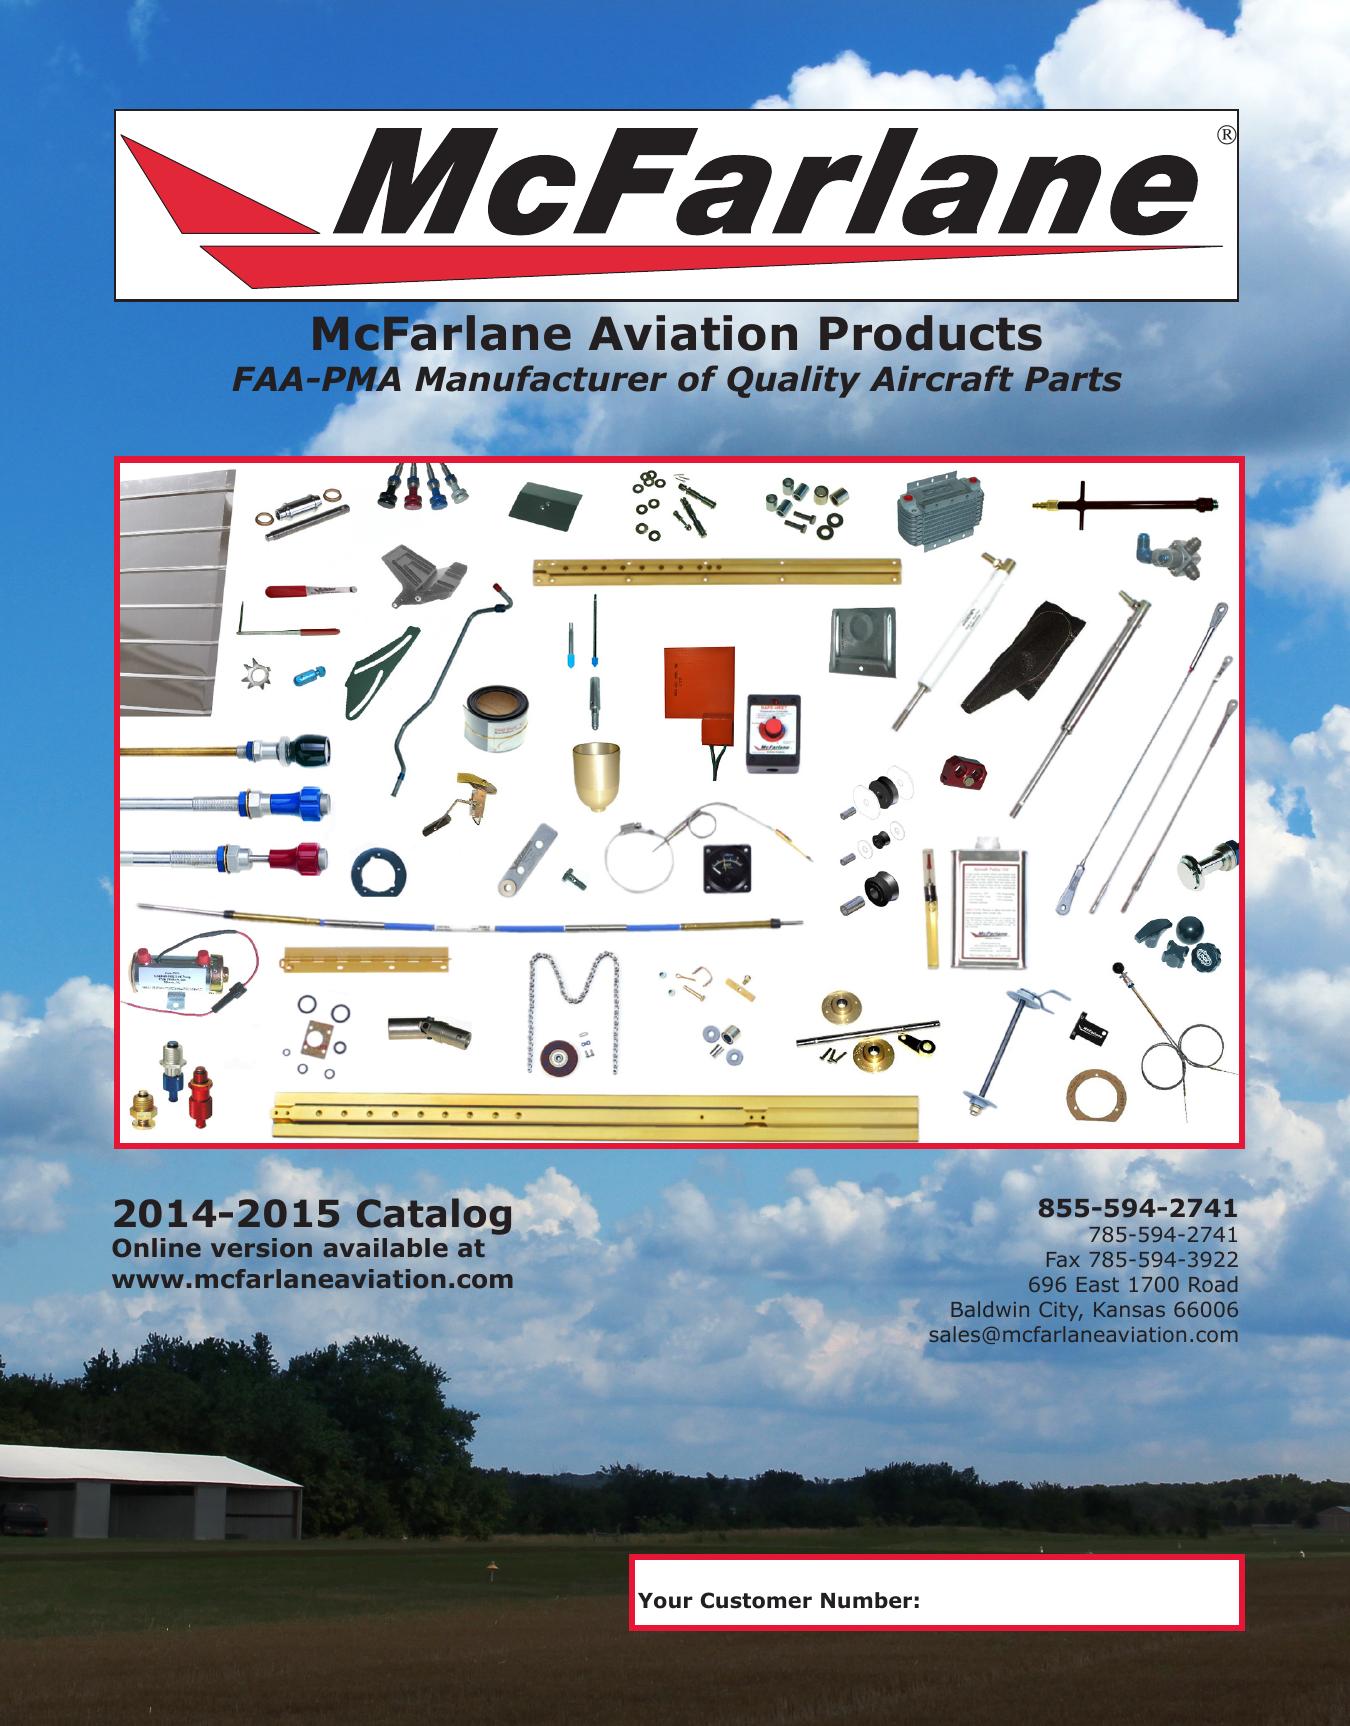 McFarlane Aviation Catalog 2014 - APS Aviation Parts Service GmbH